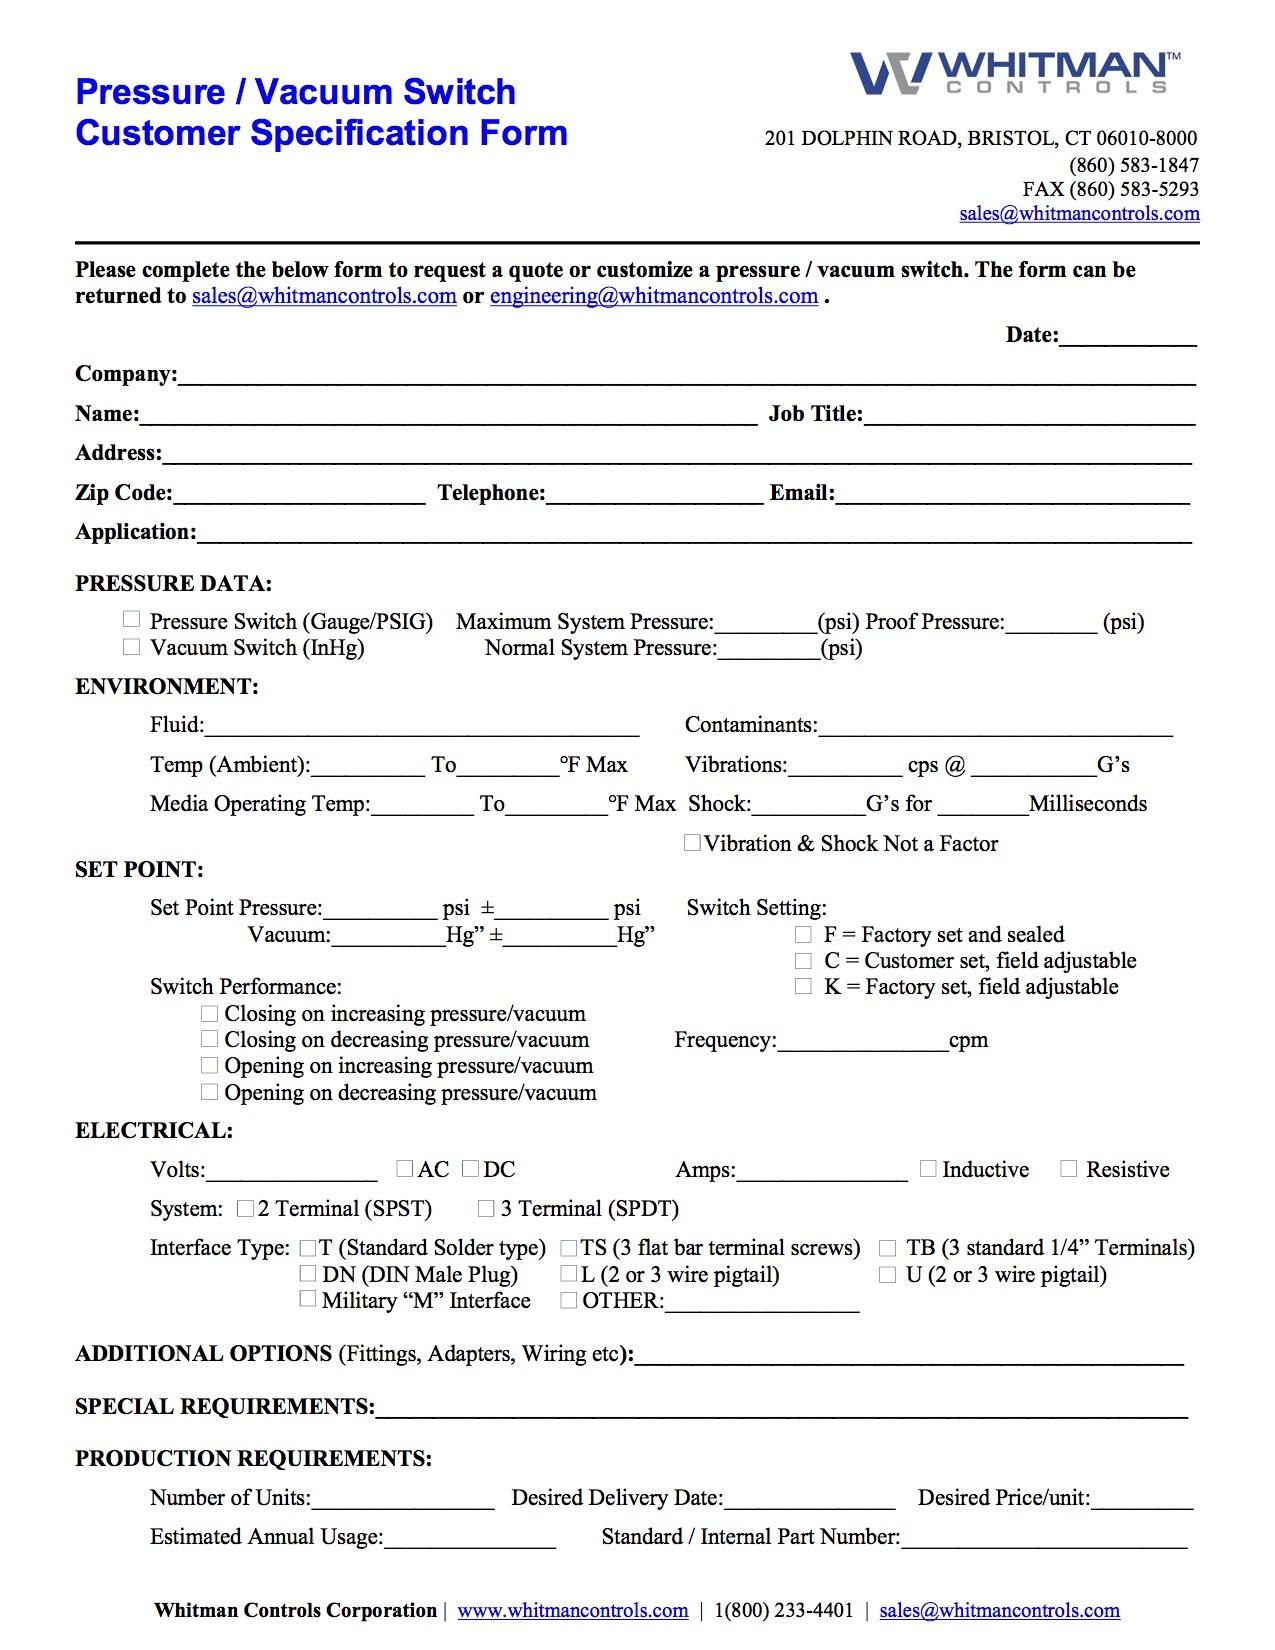 pressure vacuum online customer specification form